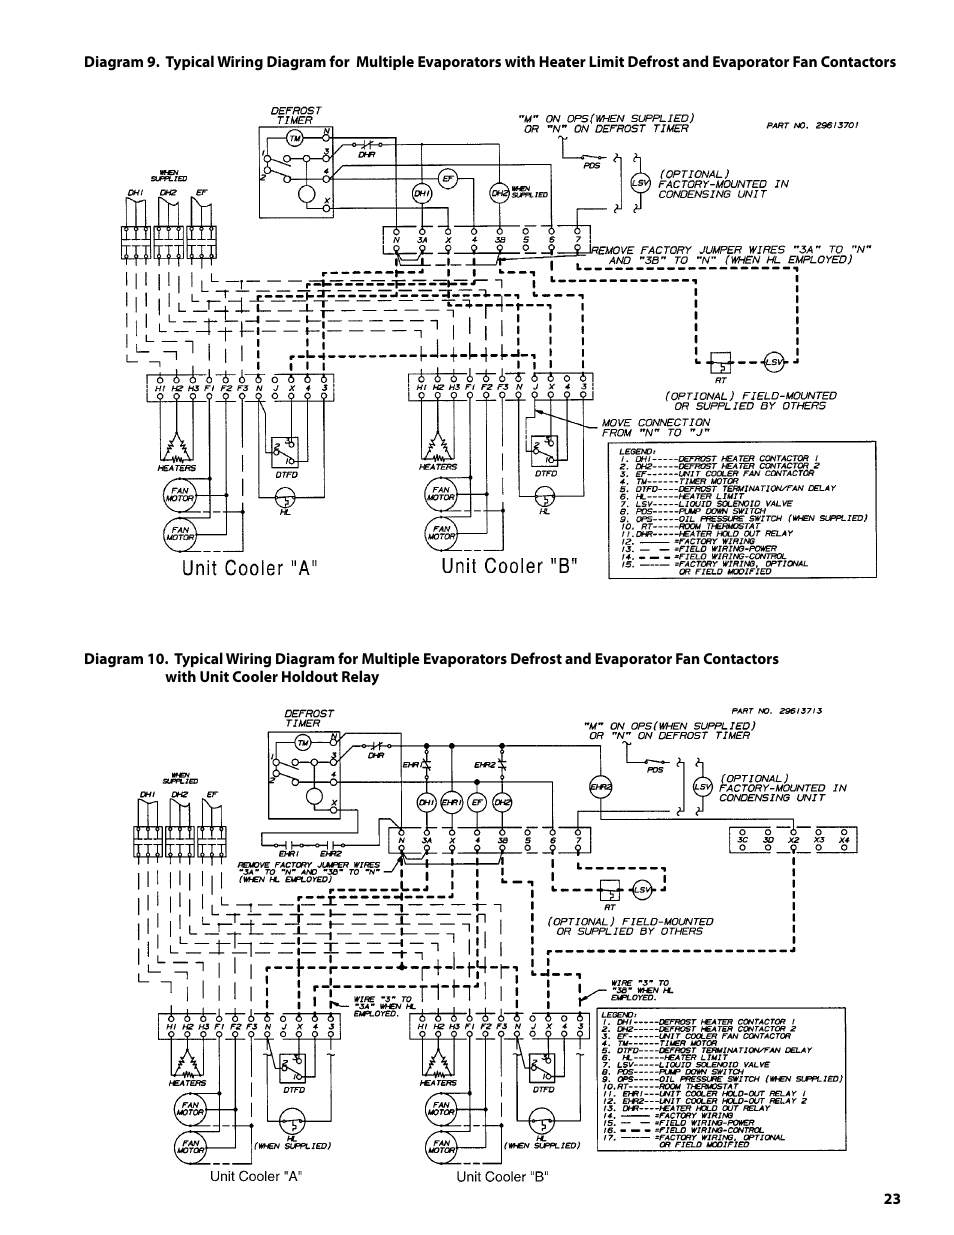 heatcraft wiring diagram wiring diagram Bohn Freezer Wiring Diagrams victory refrigeration wiring diagrams